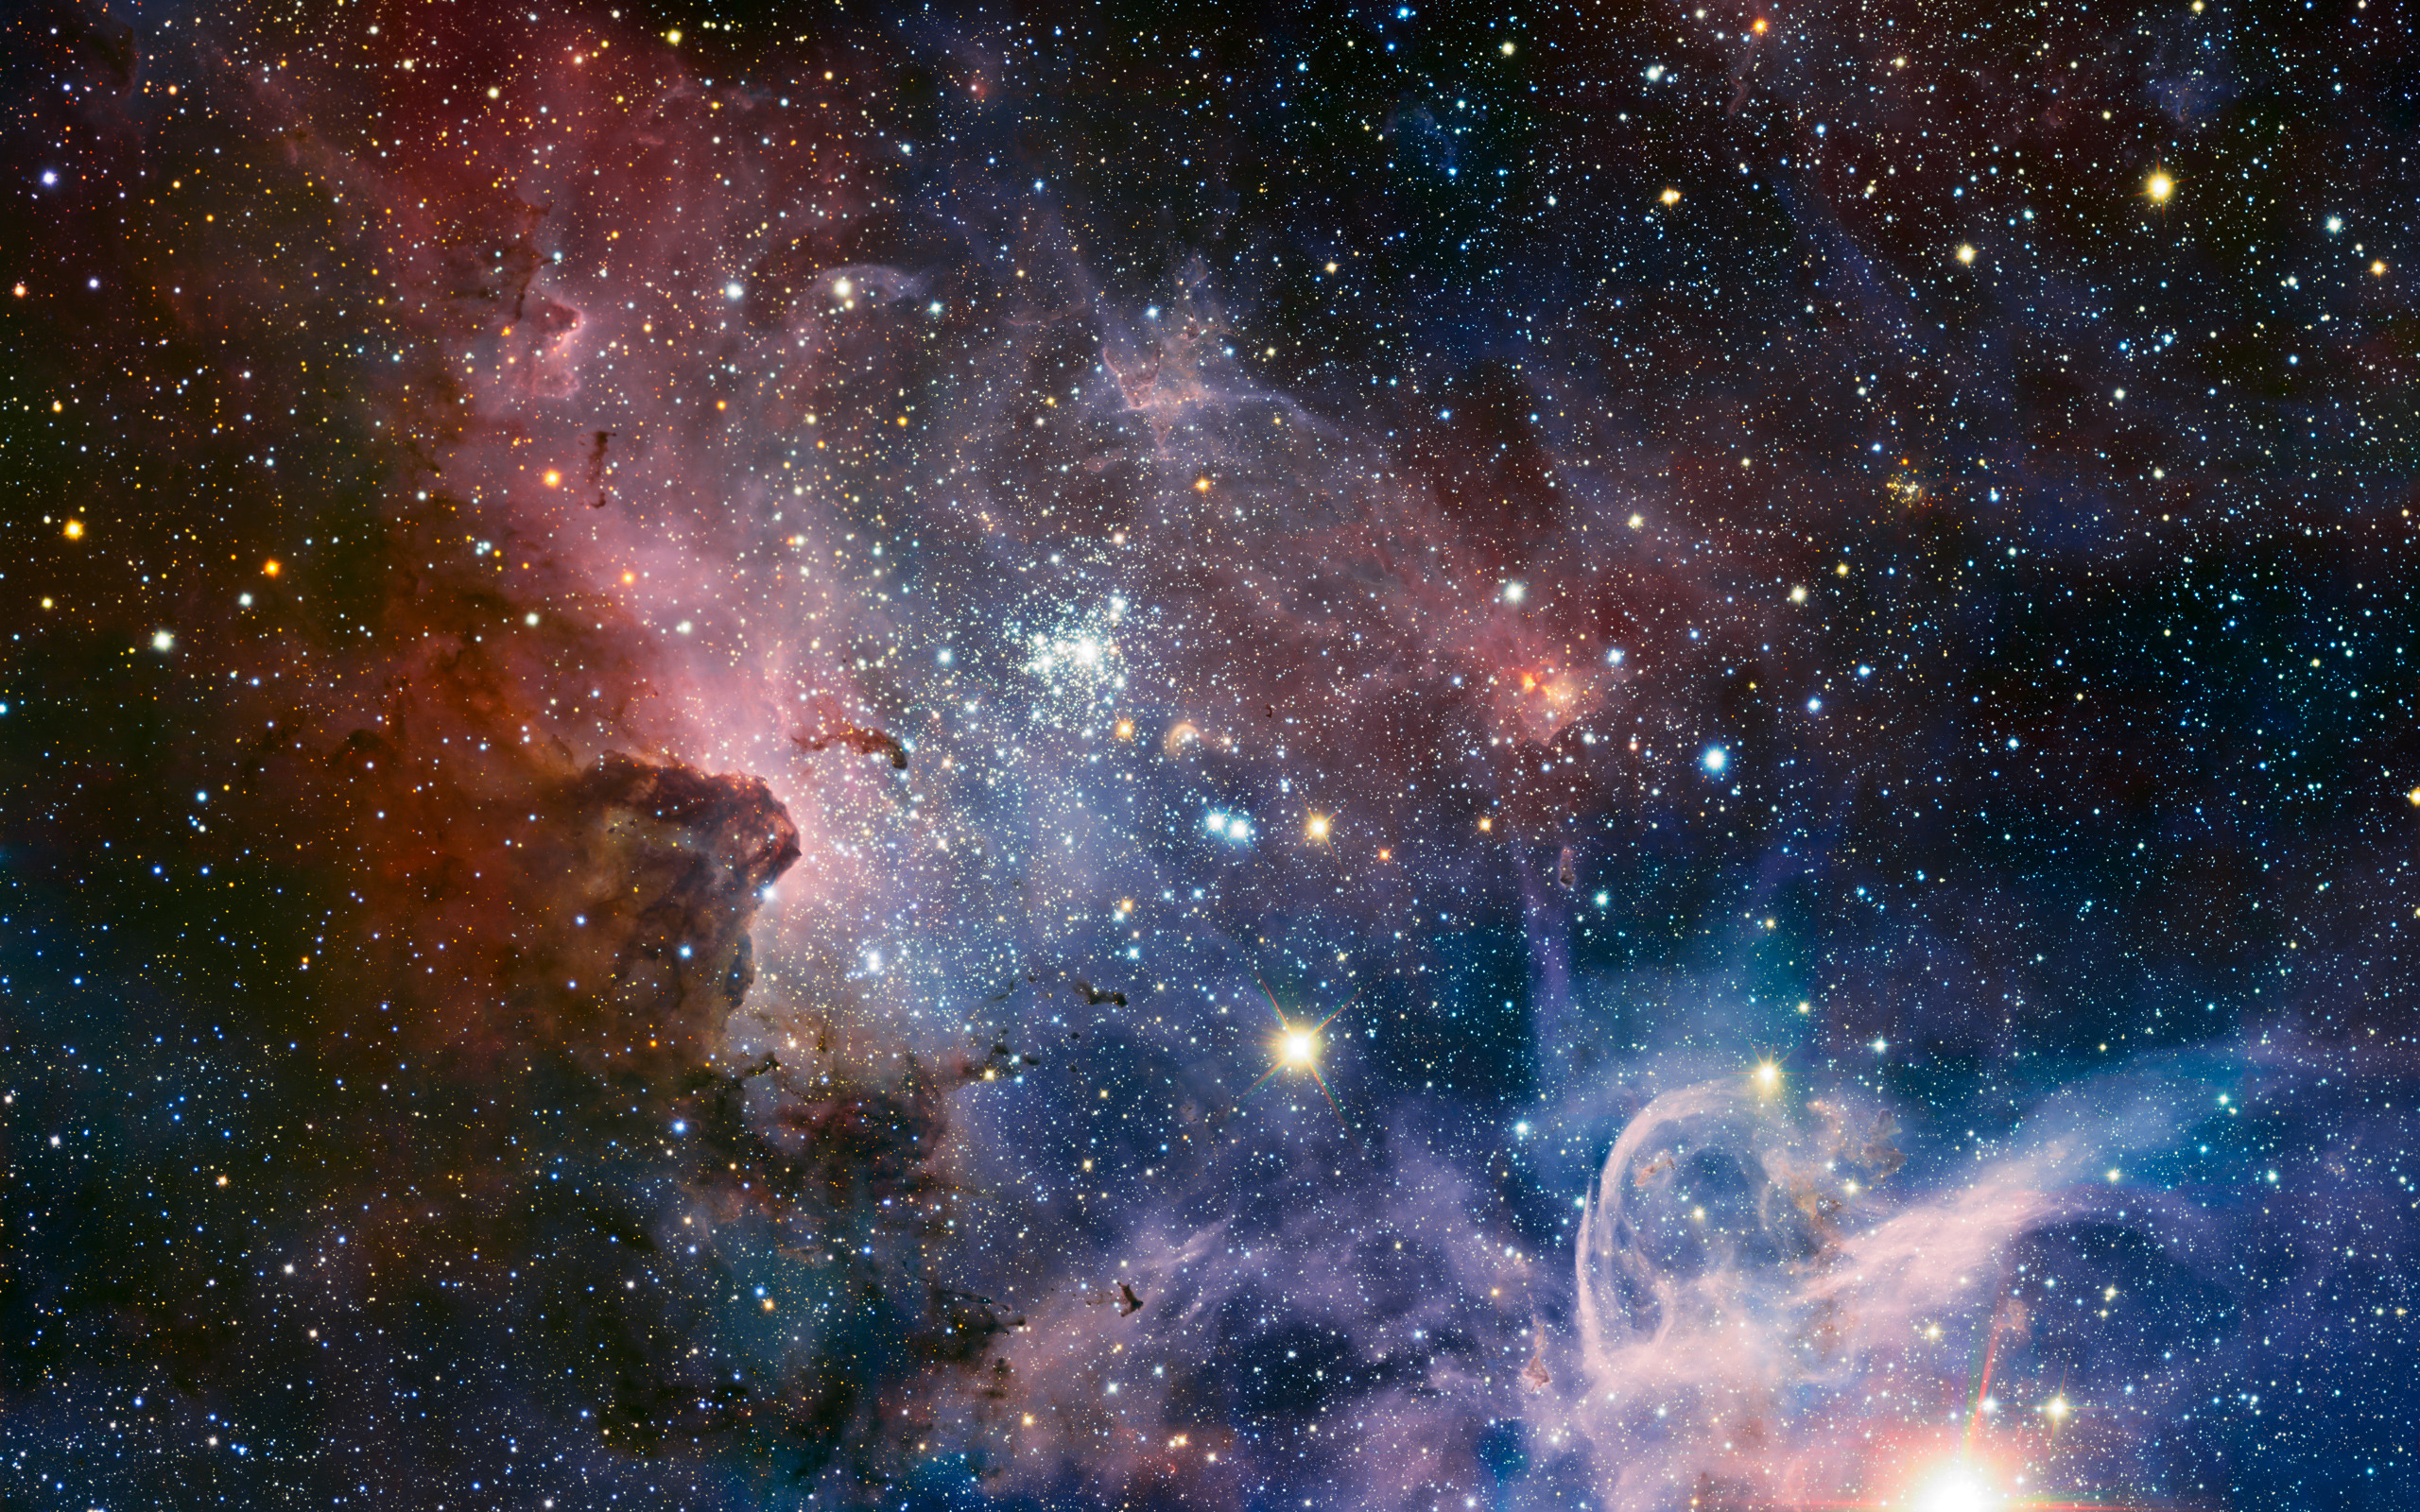 Nebula Galaxy Wallpaper Sf Wallpaper